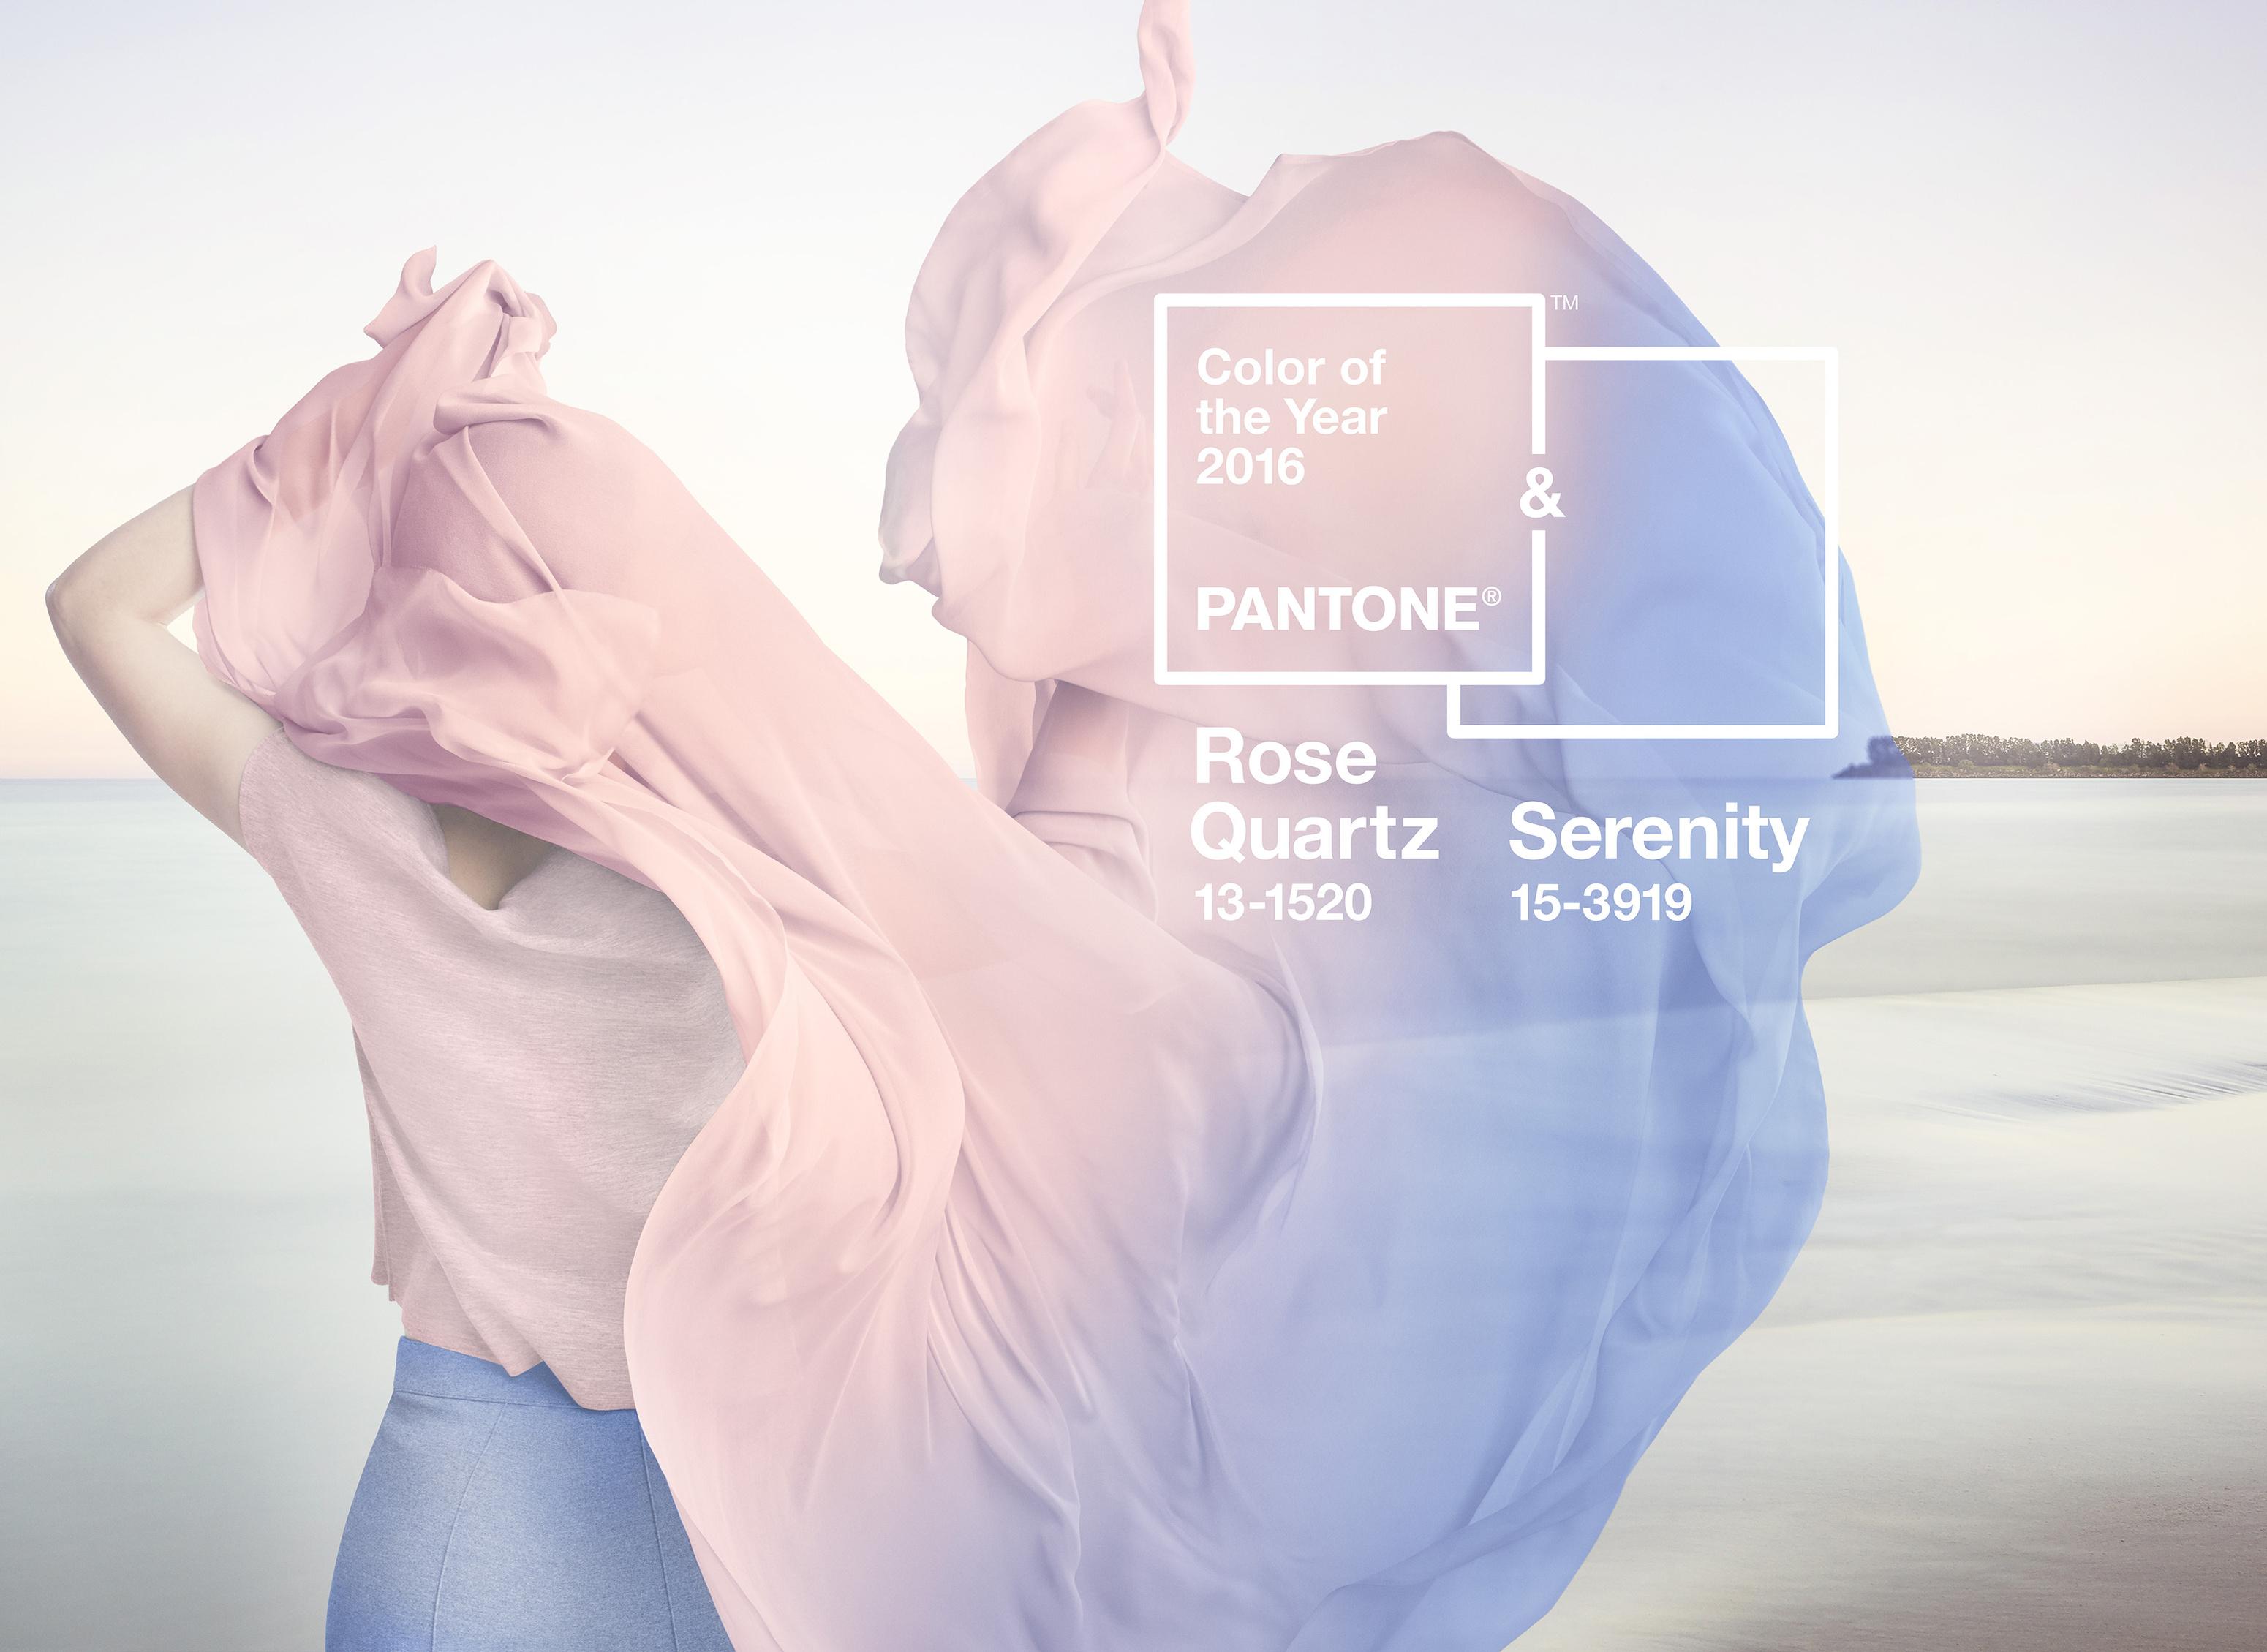 Farben des Jahres 2016: Serenity & Rose Quartz